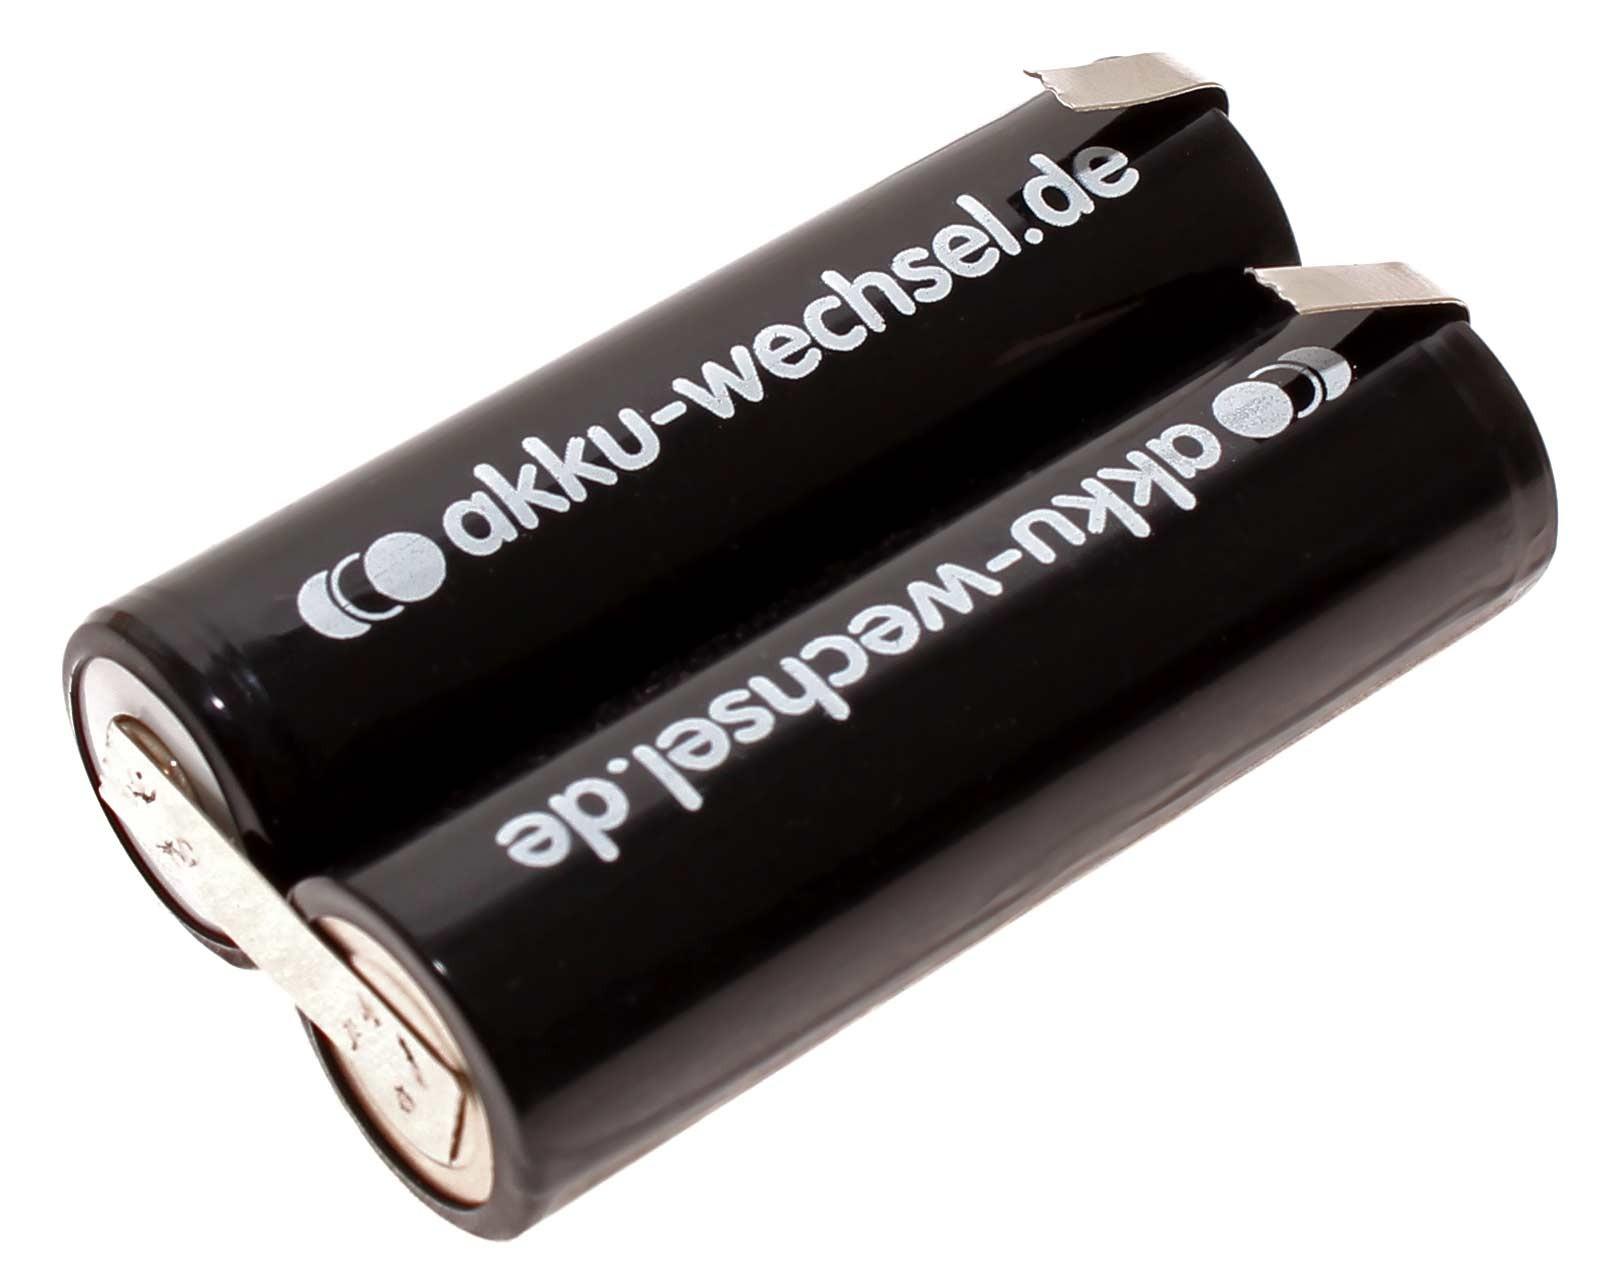 2,4V NiMH Akku für Panasonic ER150, ER151, ER152, ER153 und ER155